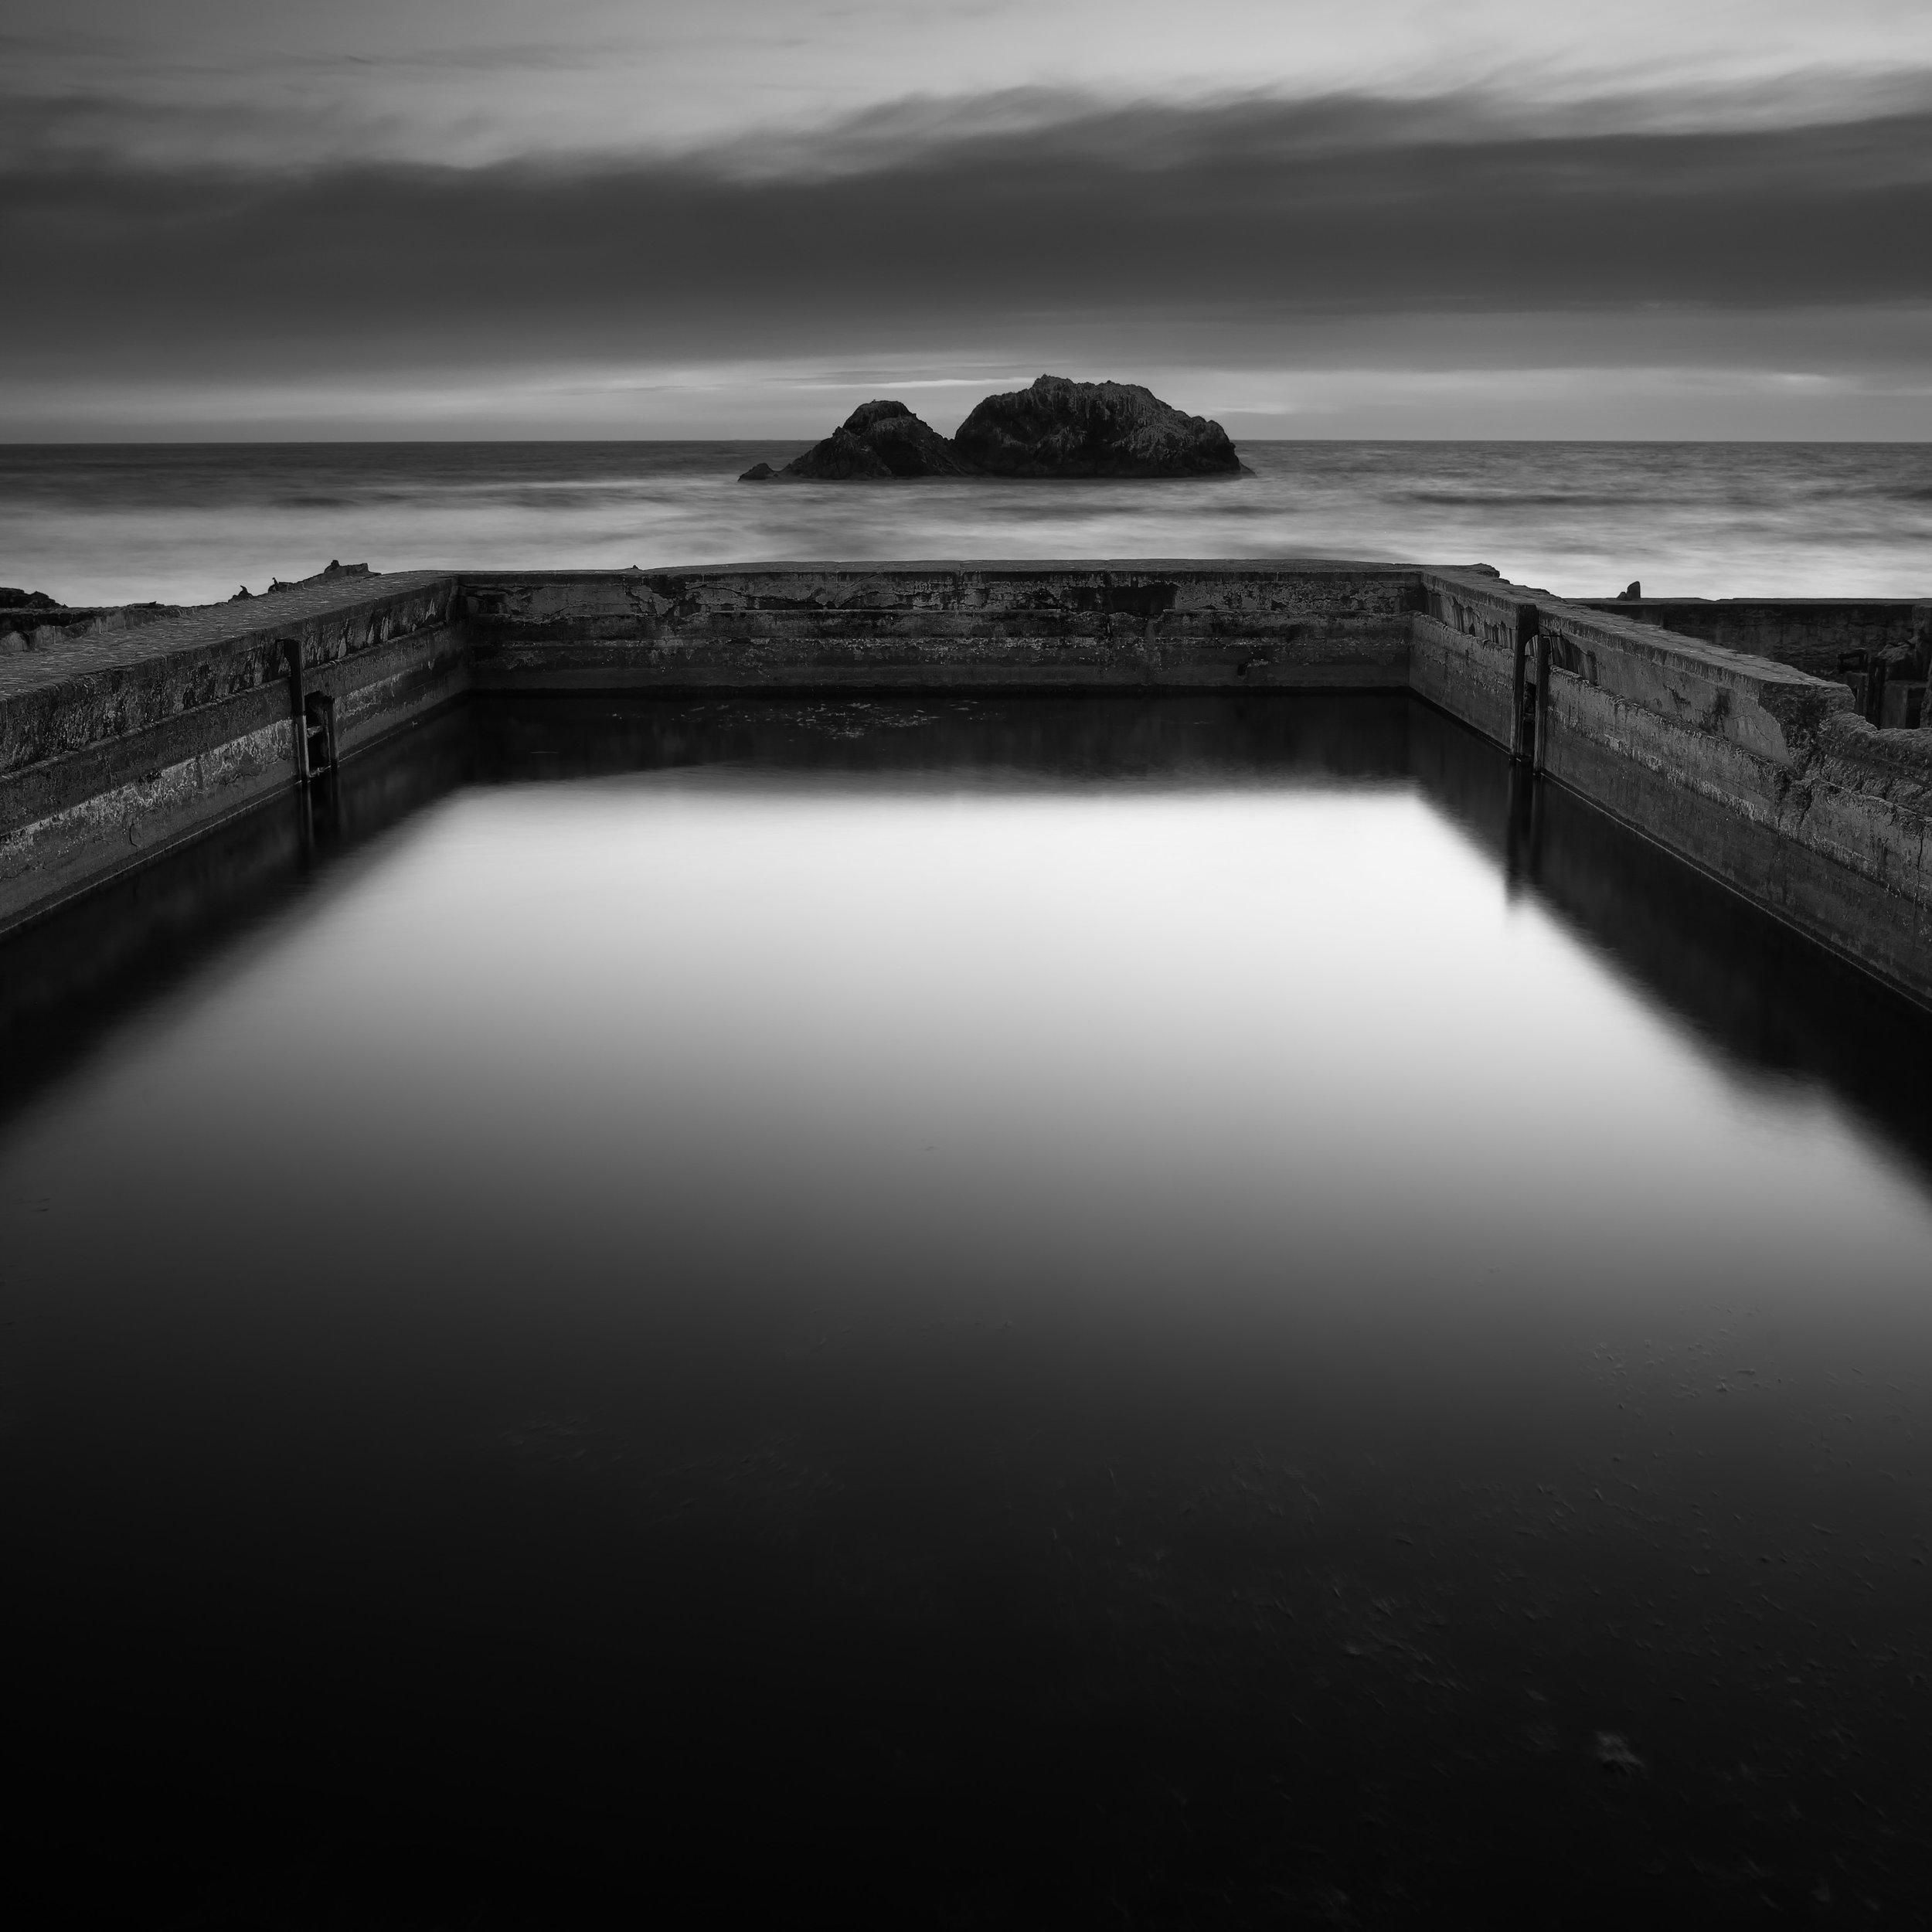 San Francisco black white sutro baths contemplation peace calm